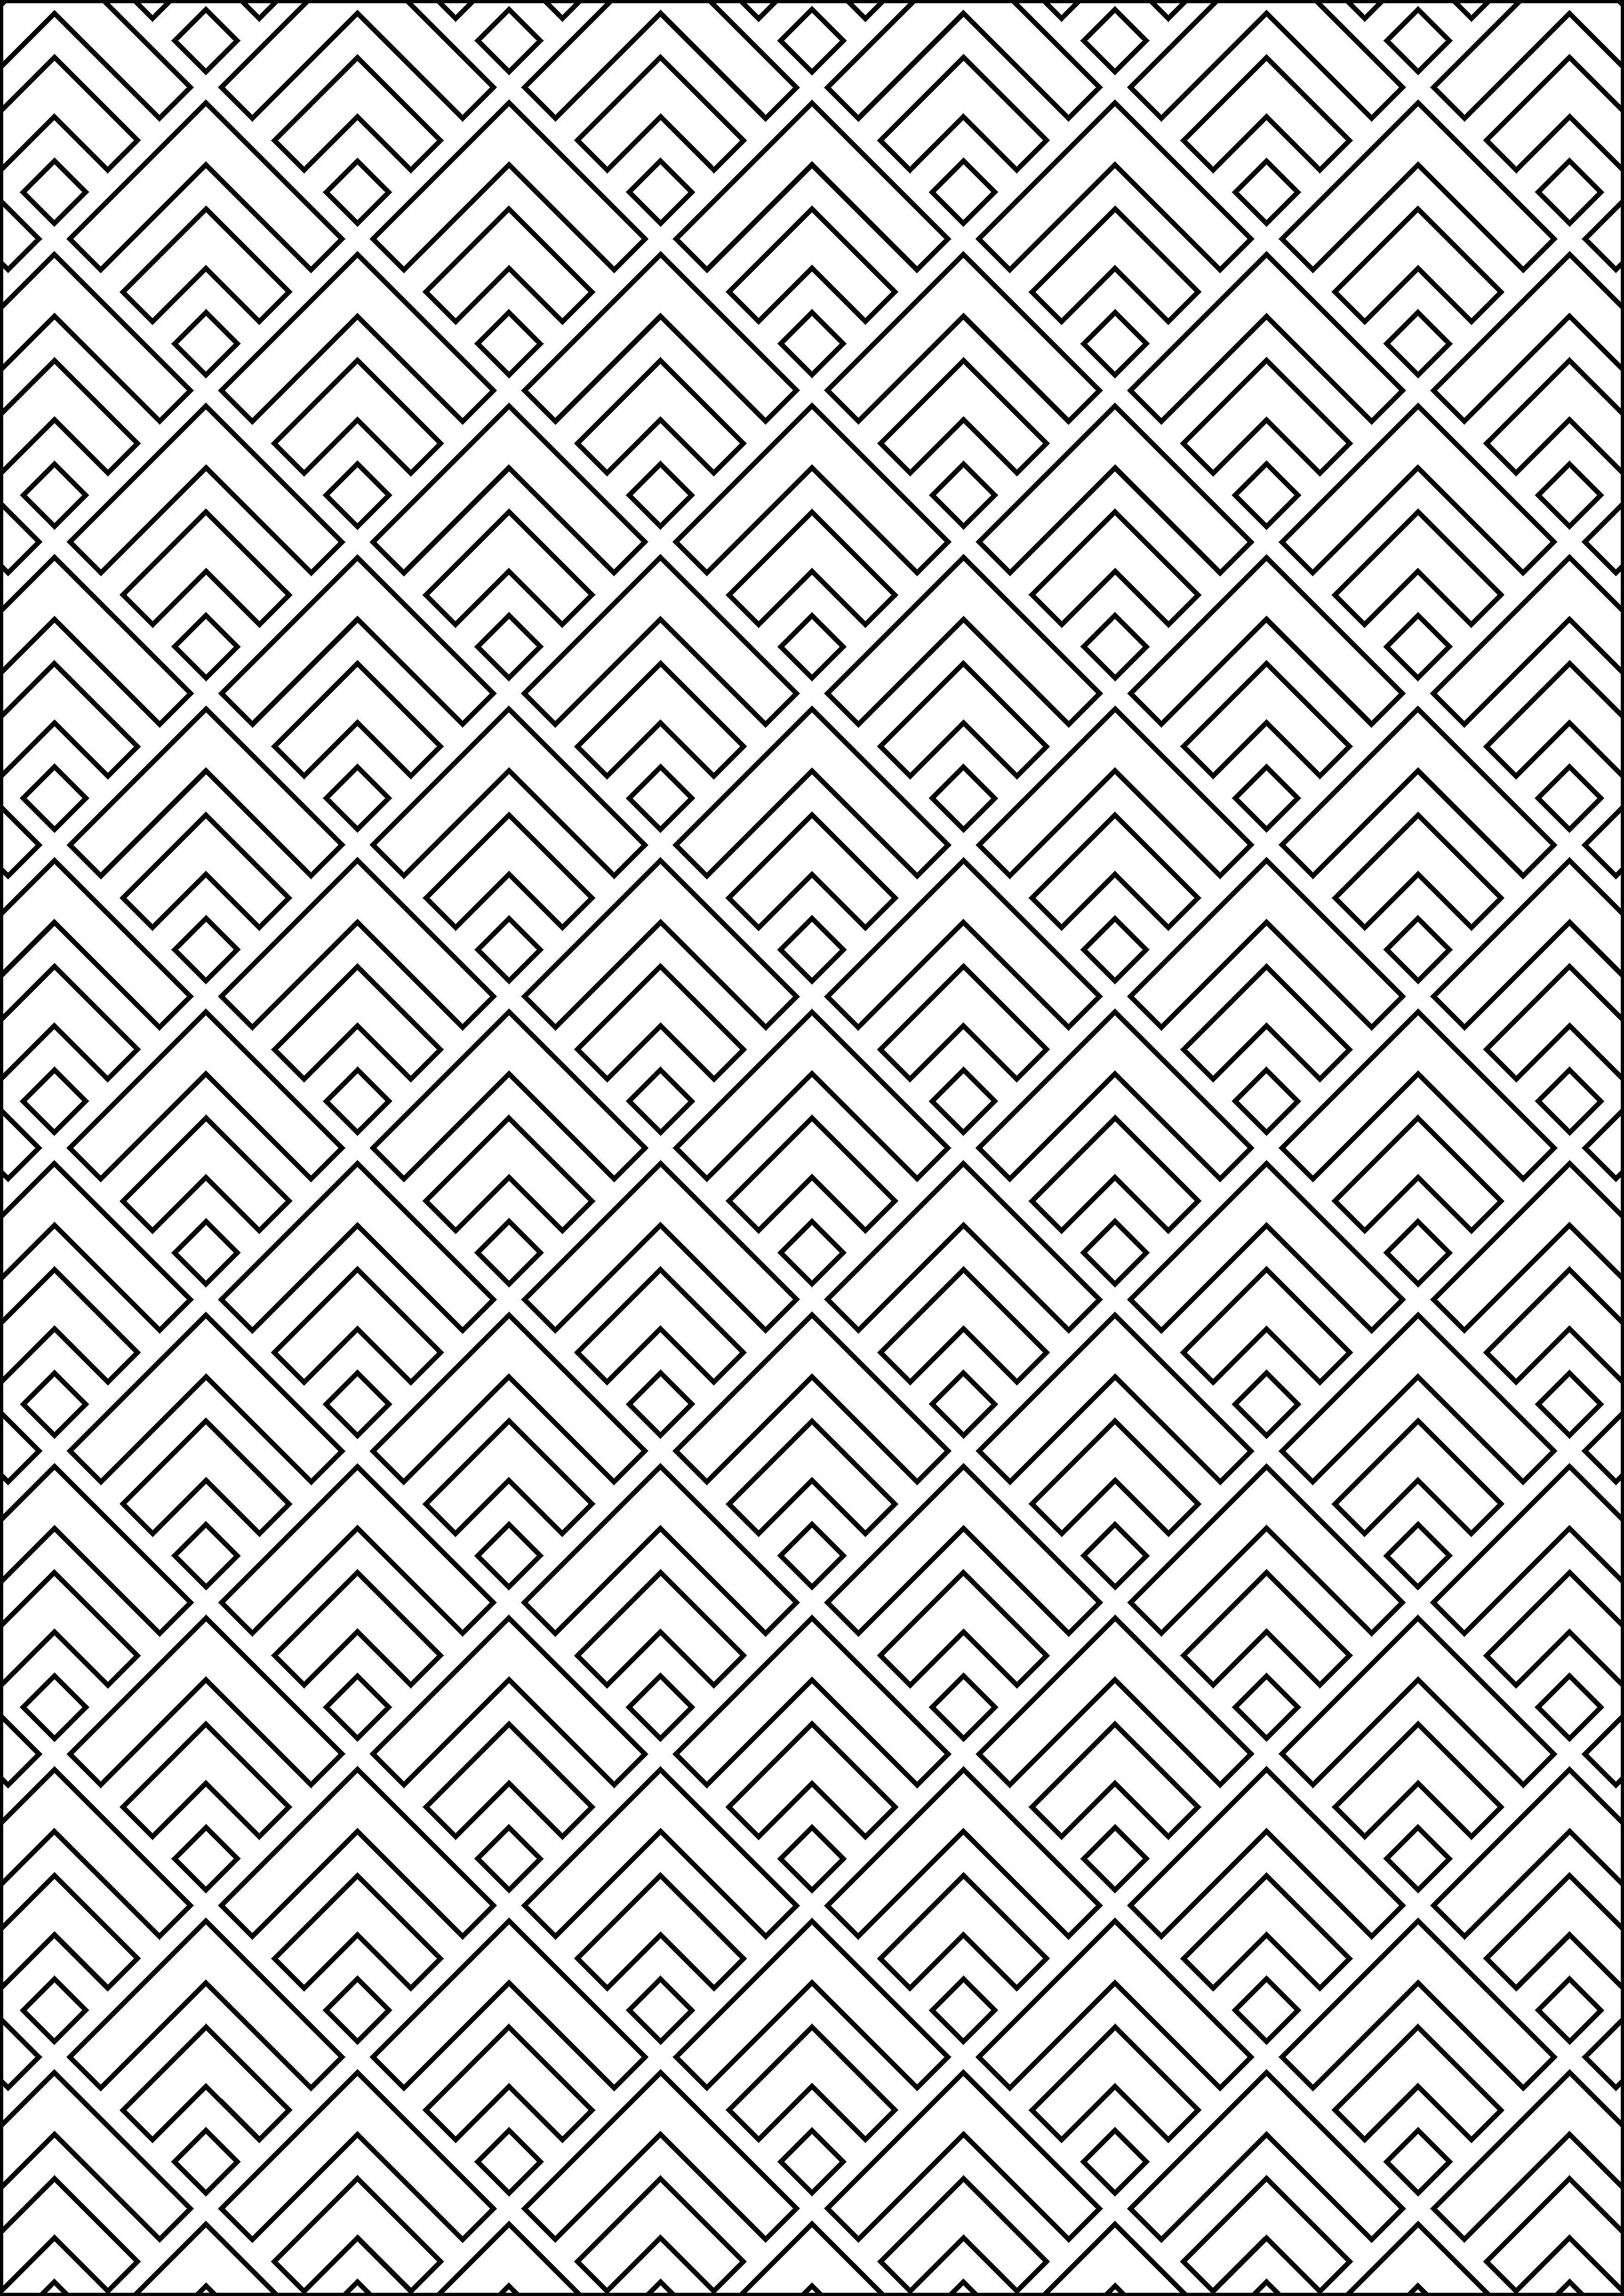 Geometric Pattern A Coloring Page Pattern Coloring Pages Geometric Coloring Pages Geometric Stencil